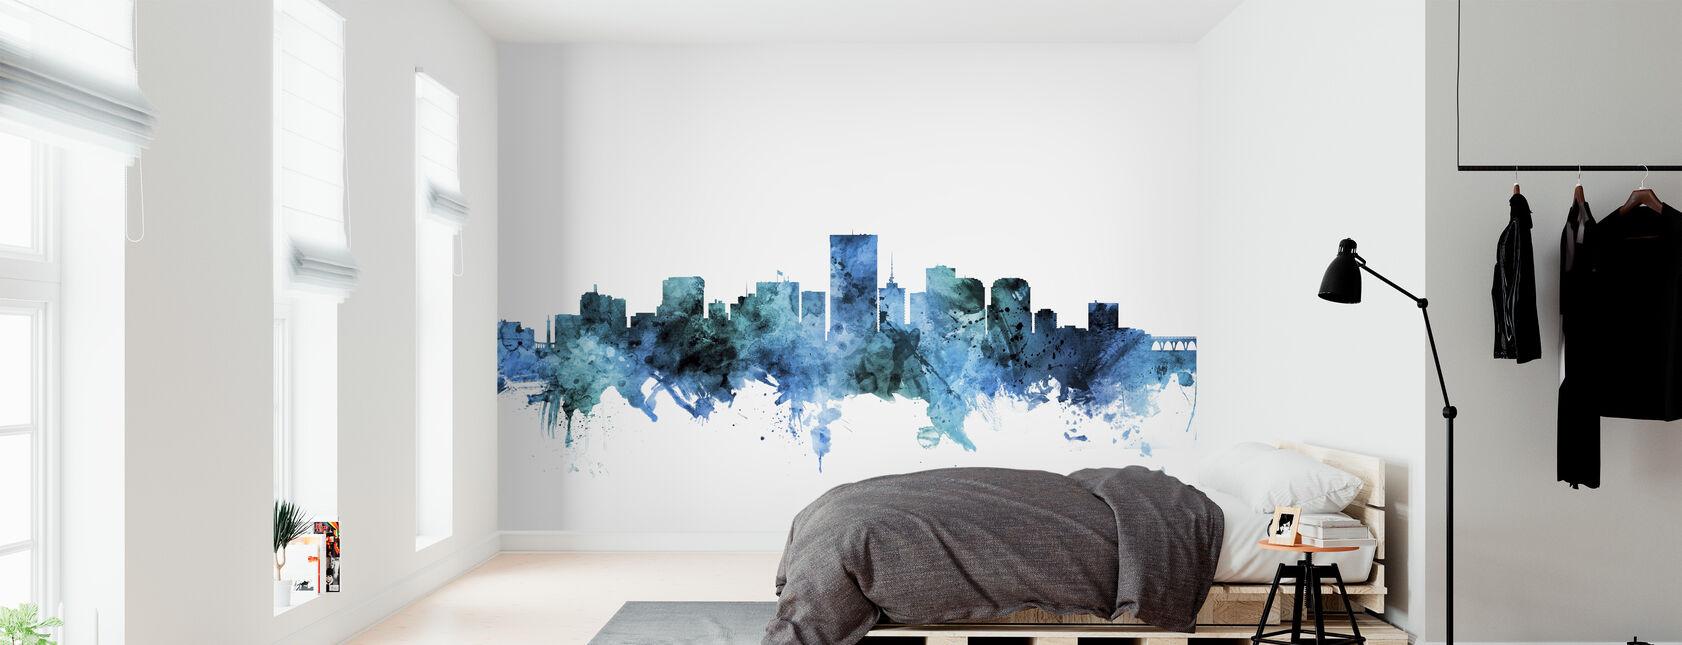 Richmond Virginia Skyline - Wallpaper - Bedroom